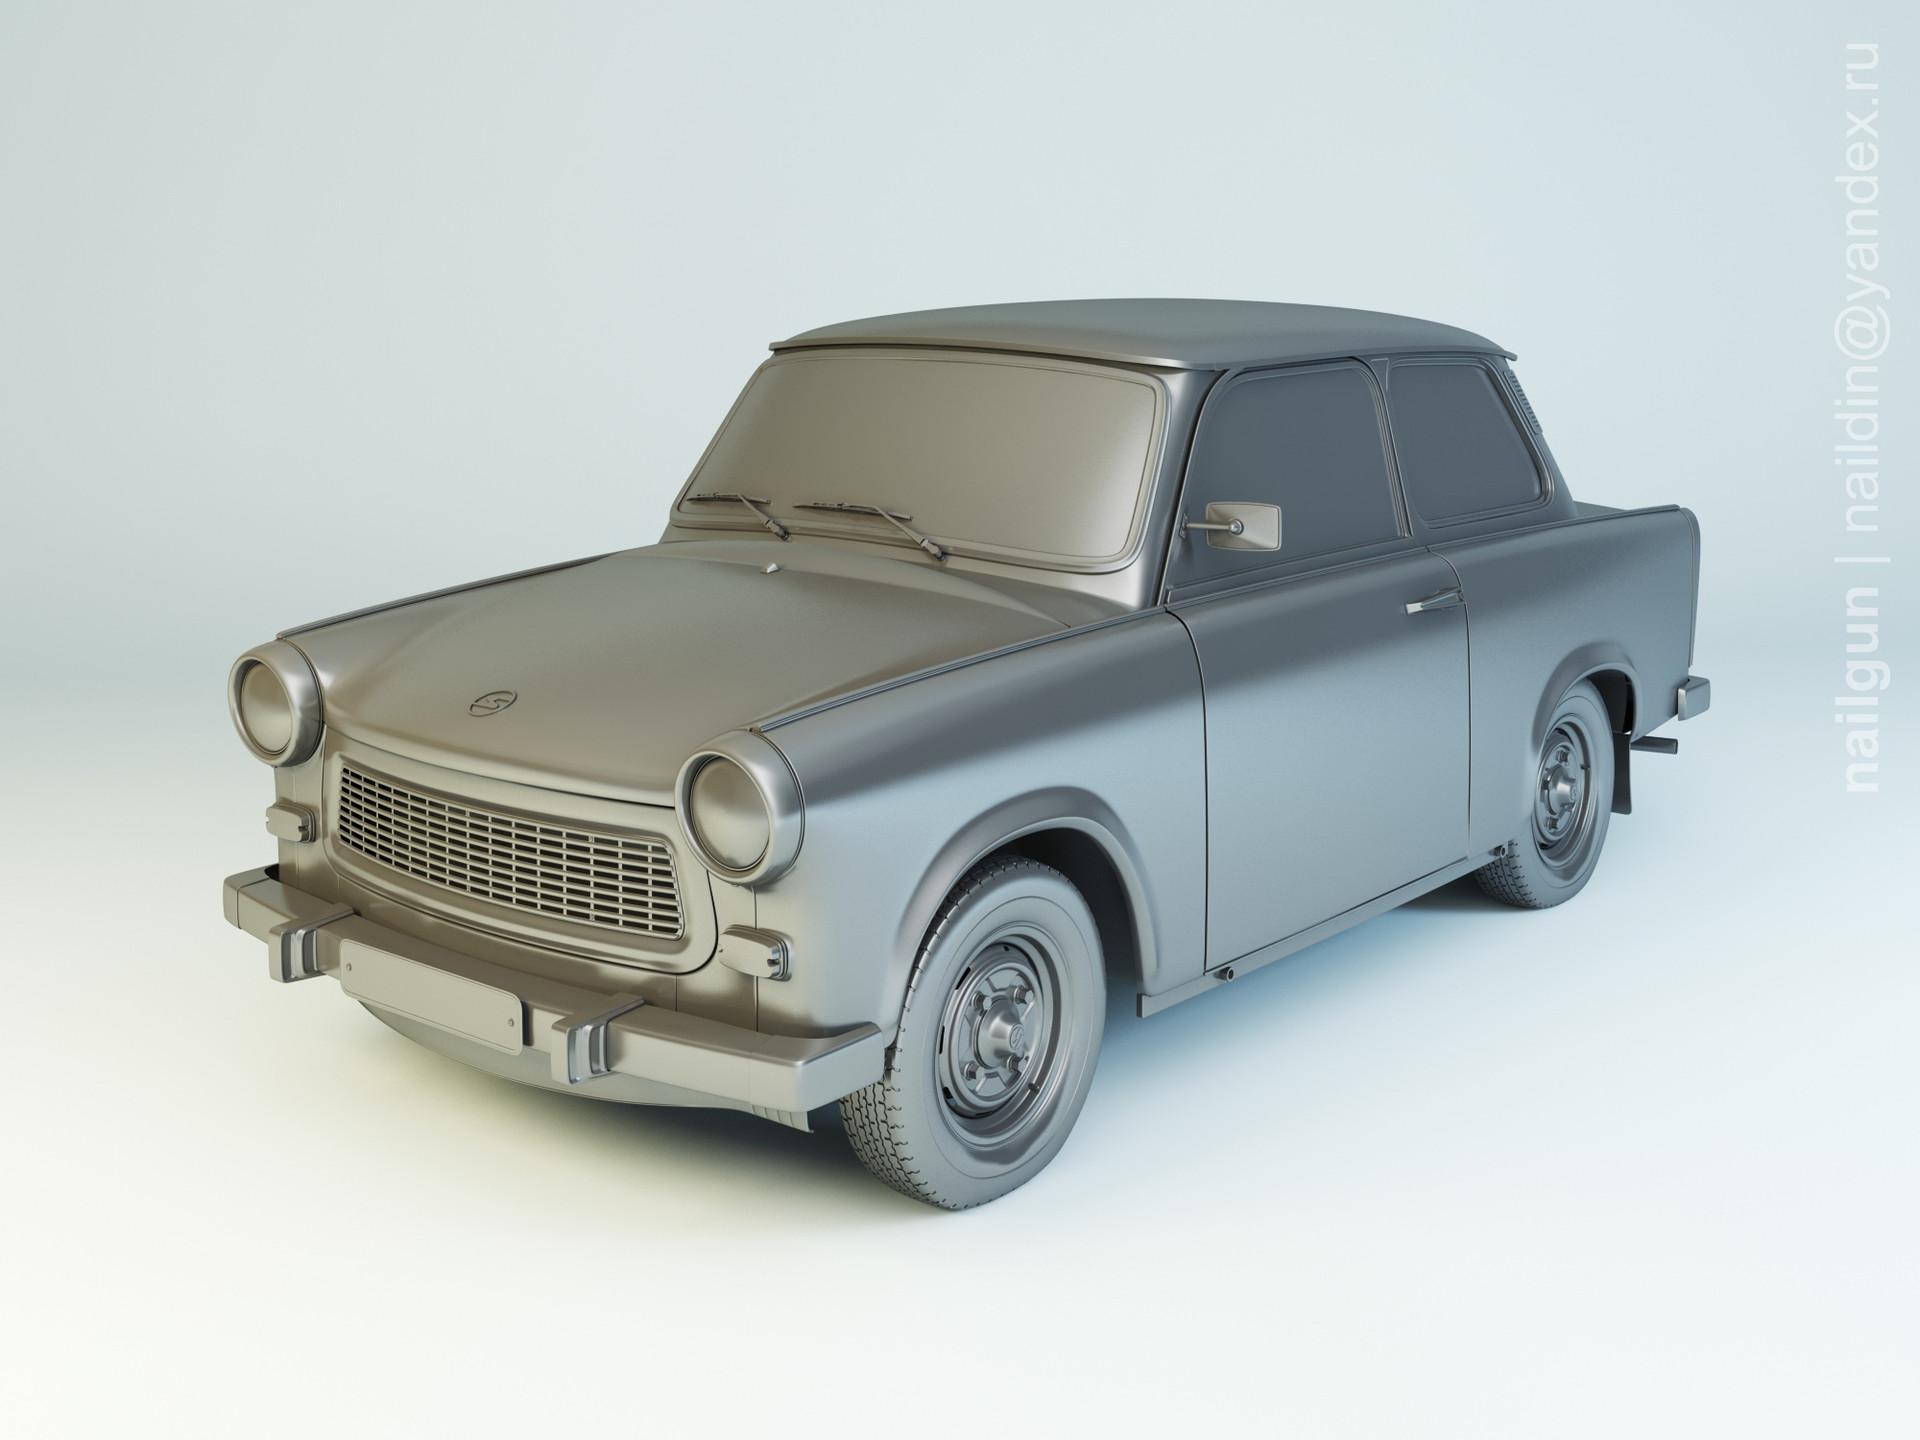 Nail khusnutdinov zals 151 000 trabant 601 limo modelling 0